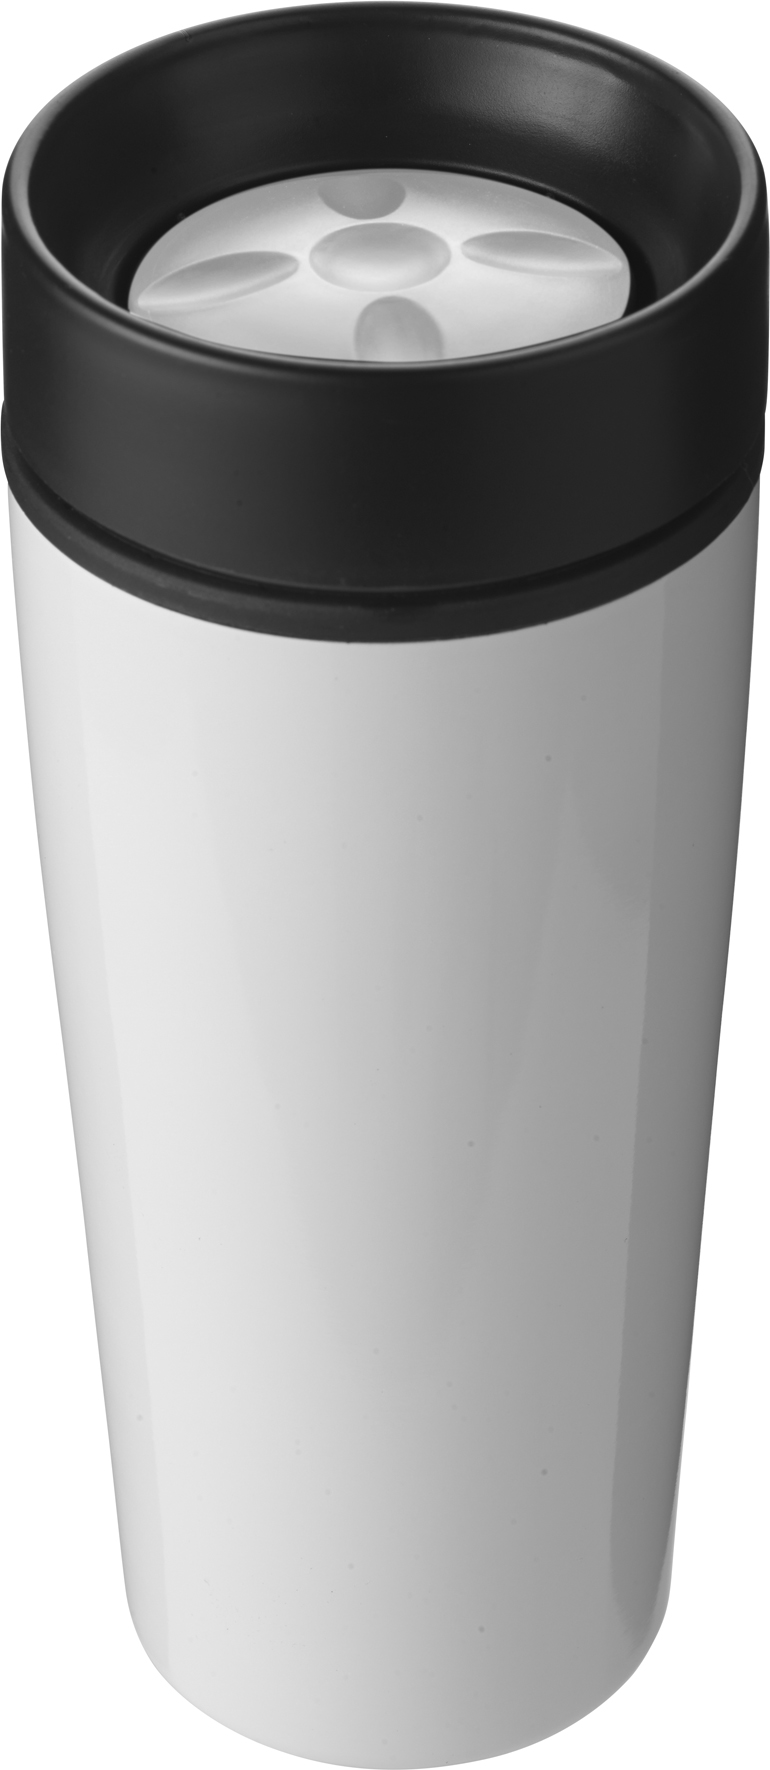 Gobelet liquido